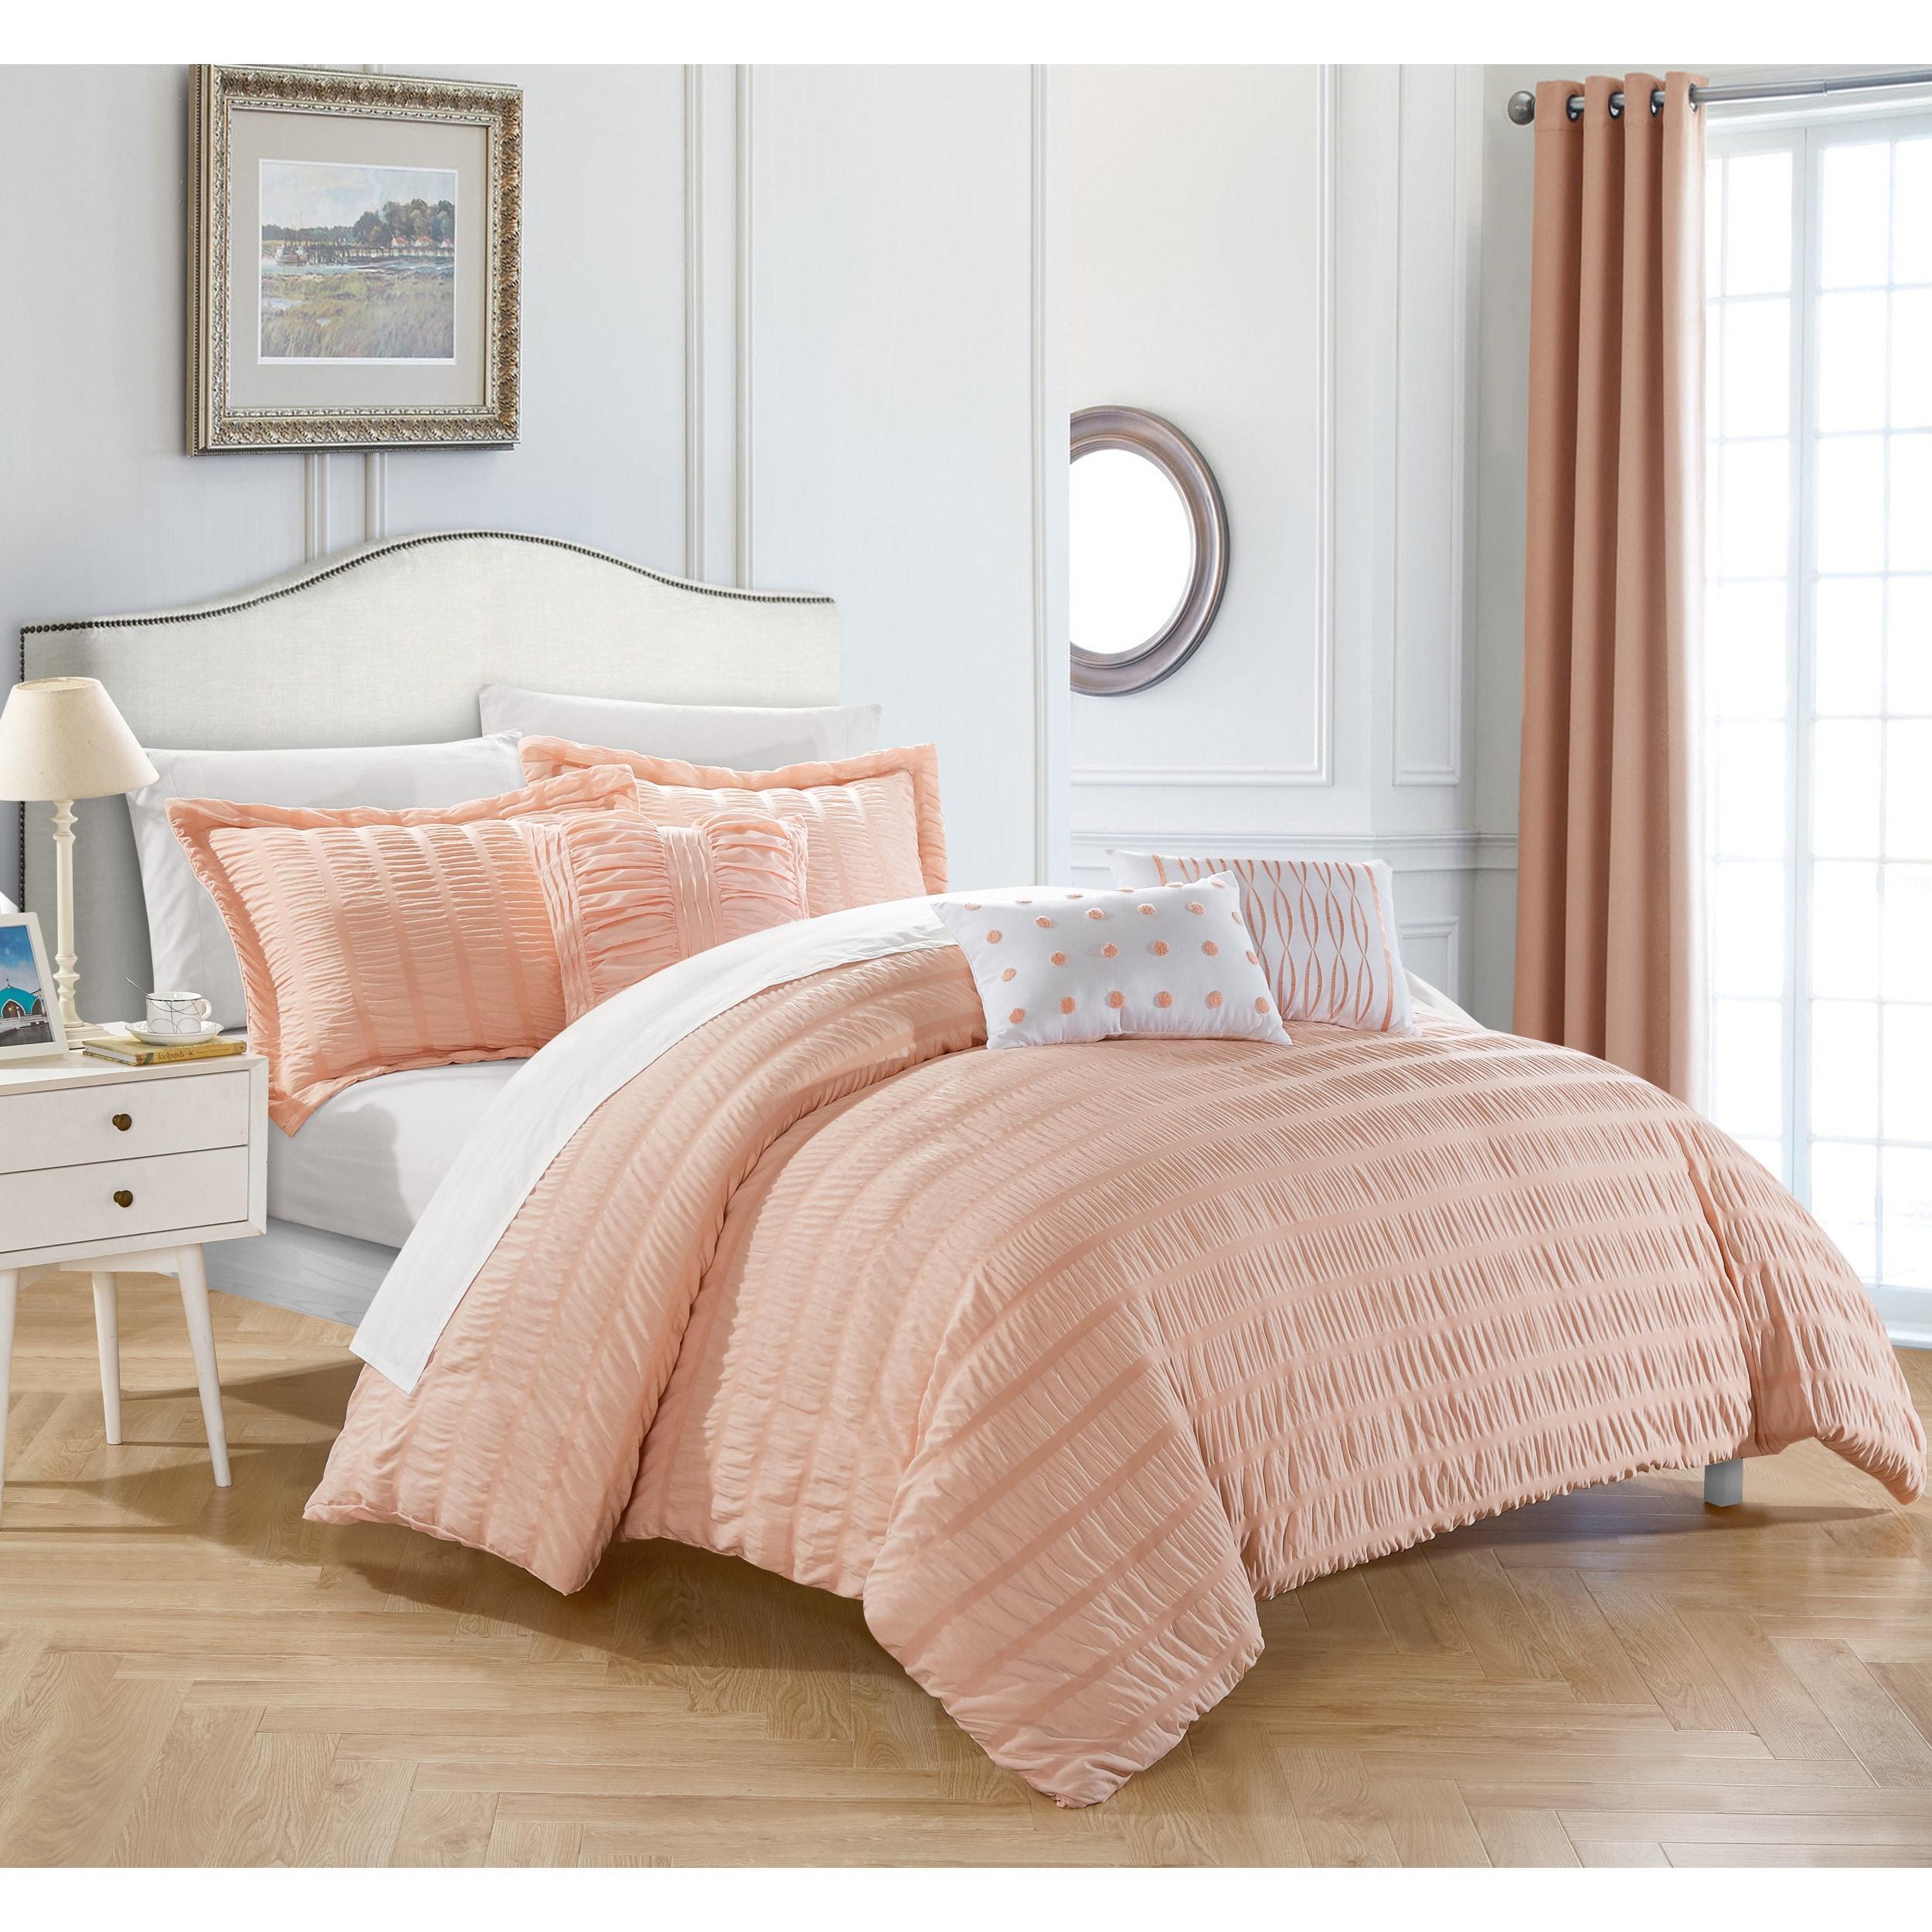 ip geo bed comforter coral in bag com bedding mainstays walmart set a